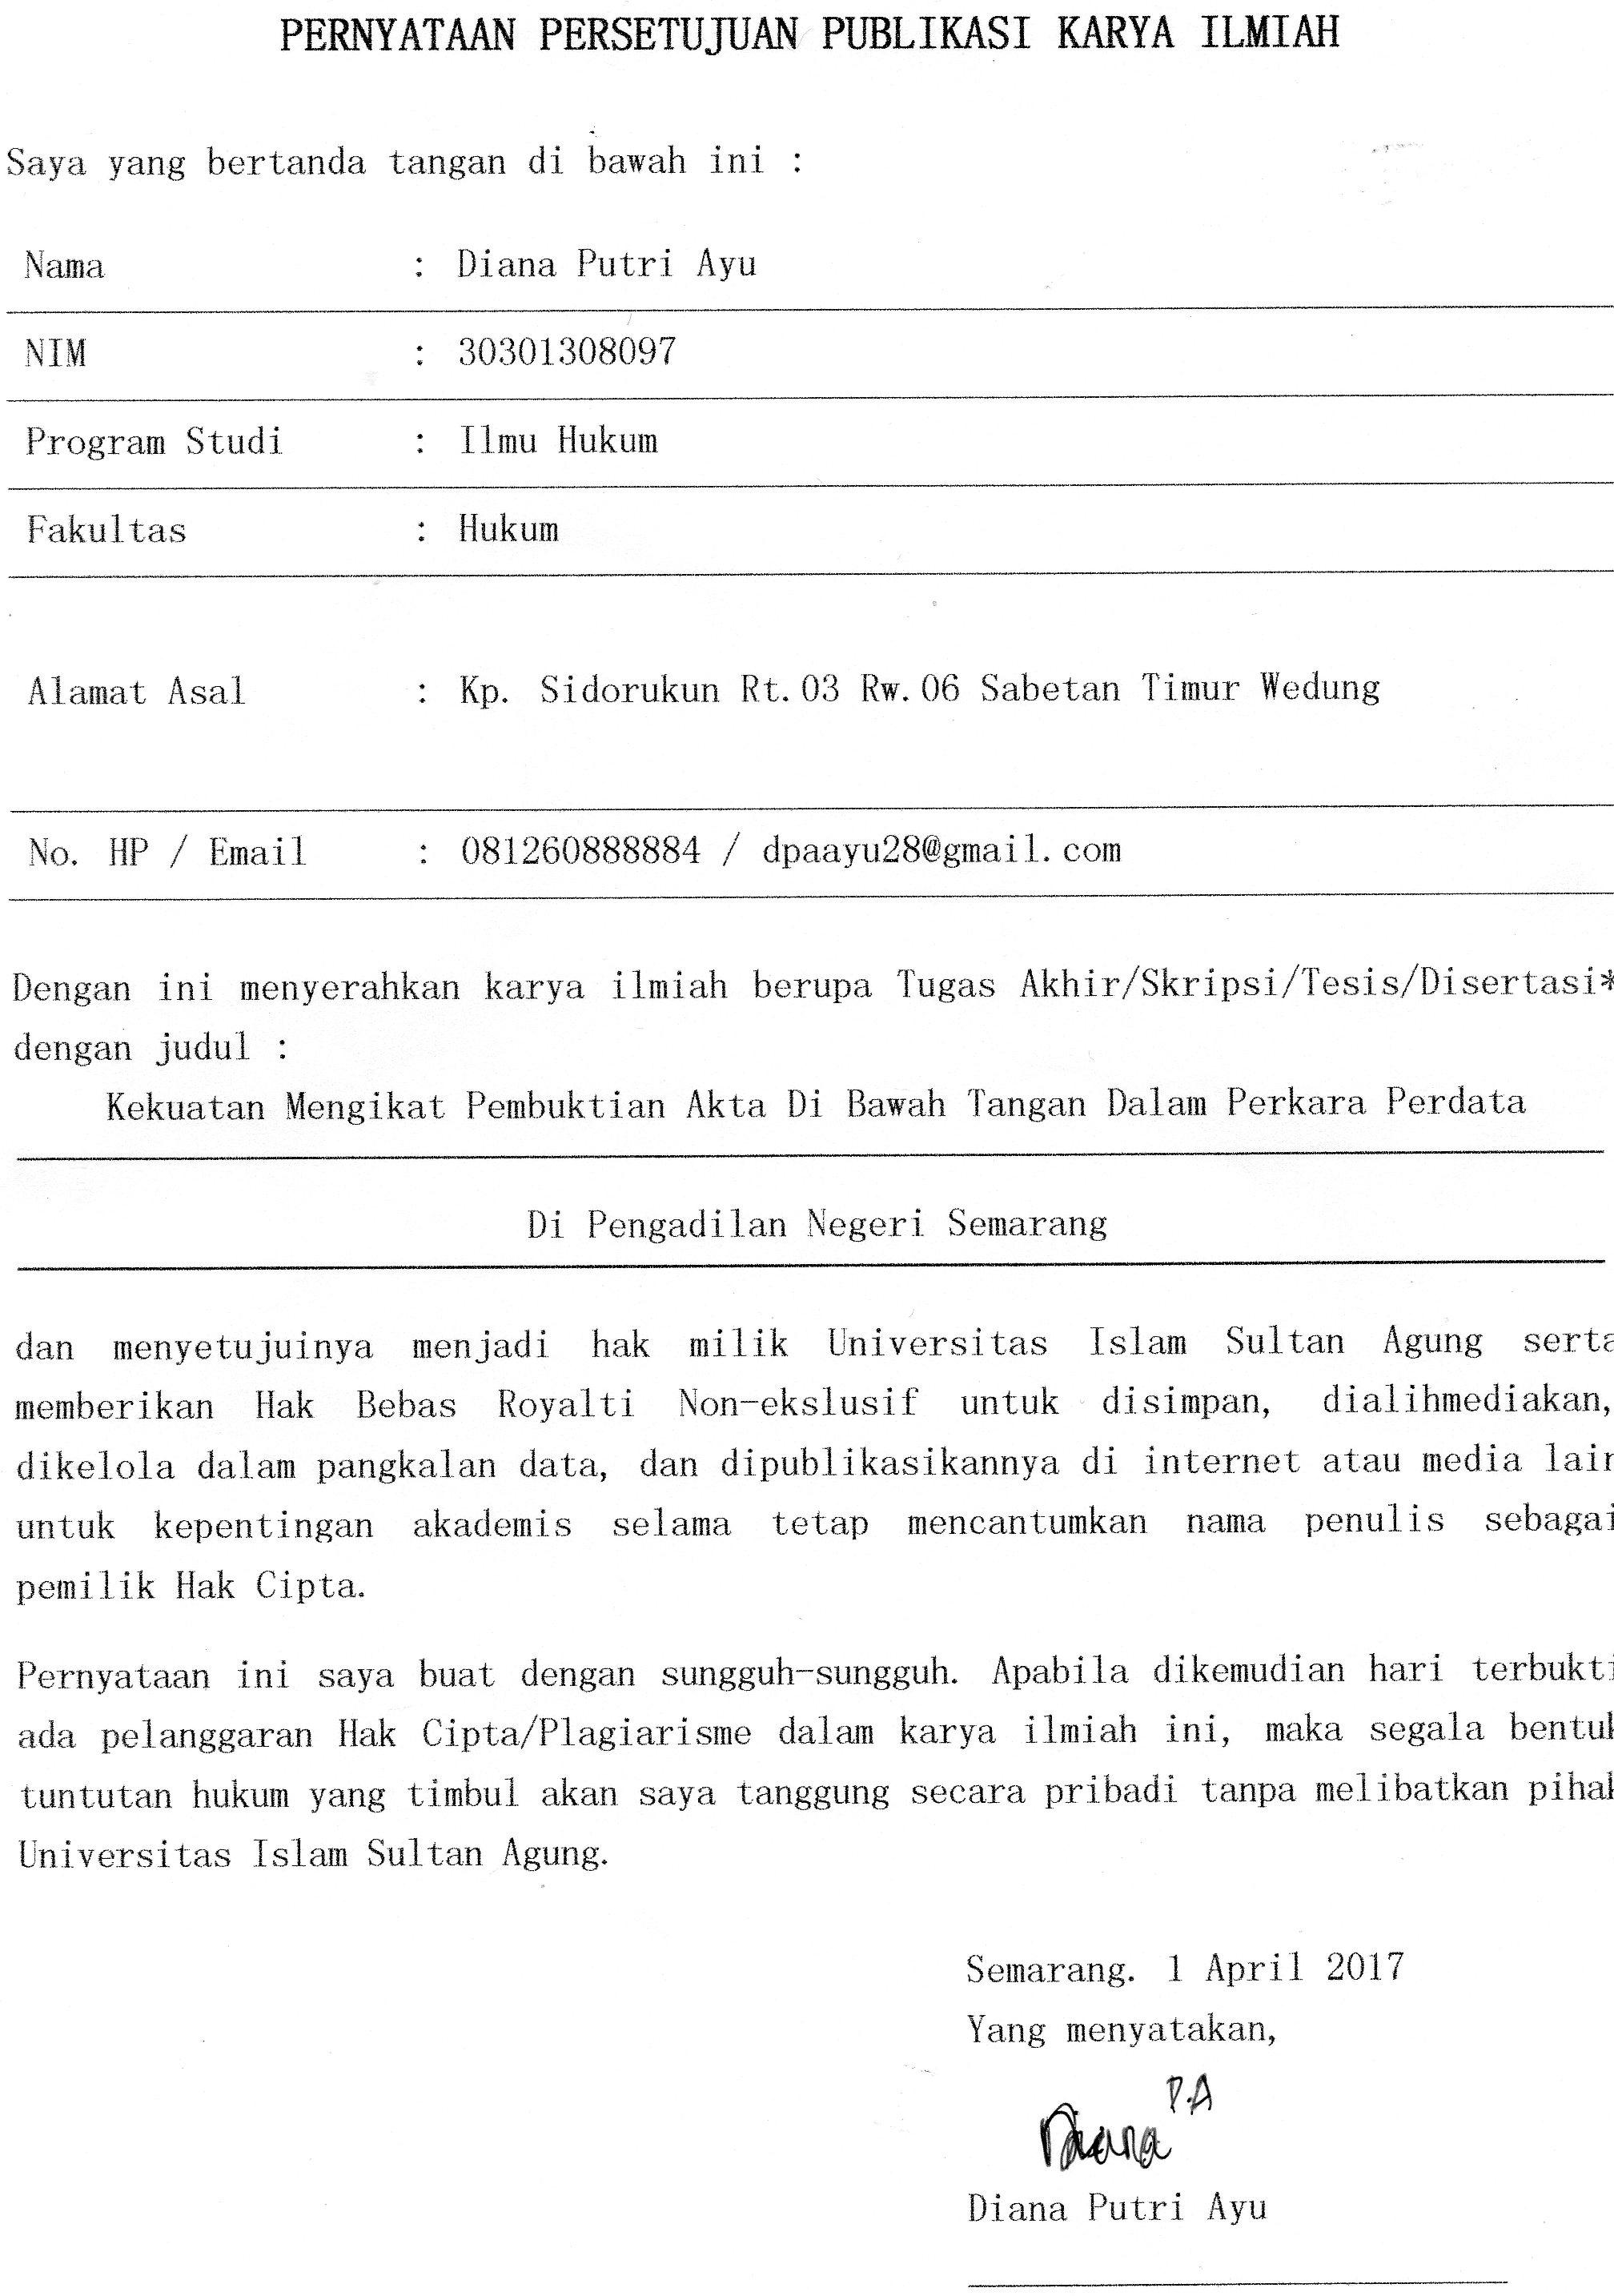 Kekuatan Mengikat Pembuktian Akta Di Bawah Tangan Dalam Perkara Perdata Di Pengadilan Negeri Semarang Studi Kasus No 119 Perdata G 2015 Pn Smg Unissula Repository